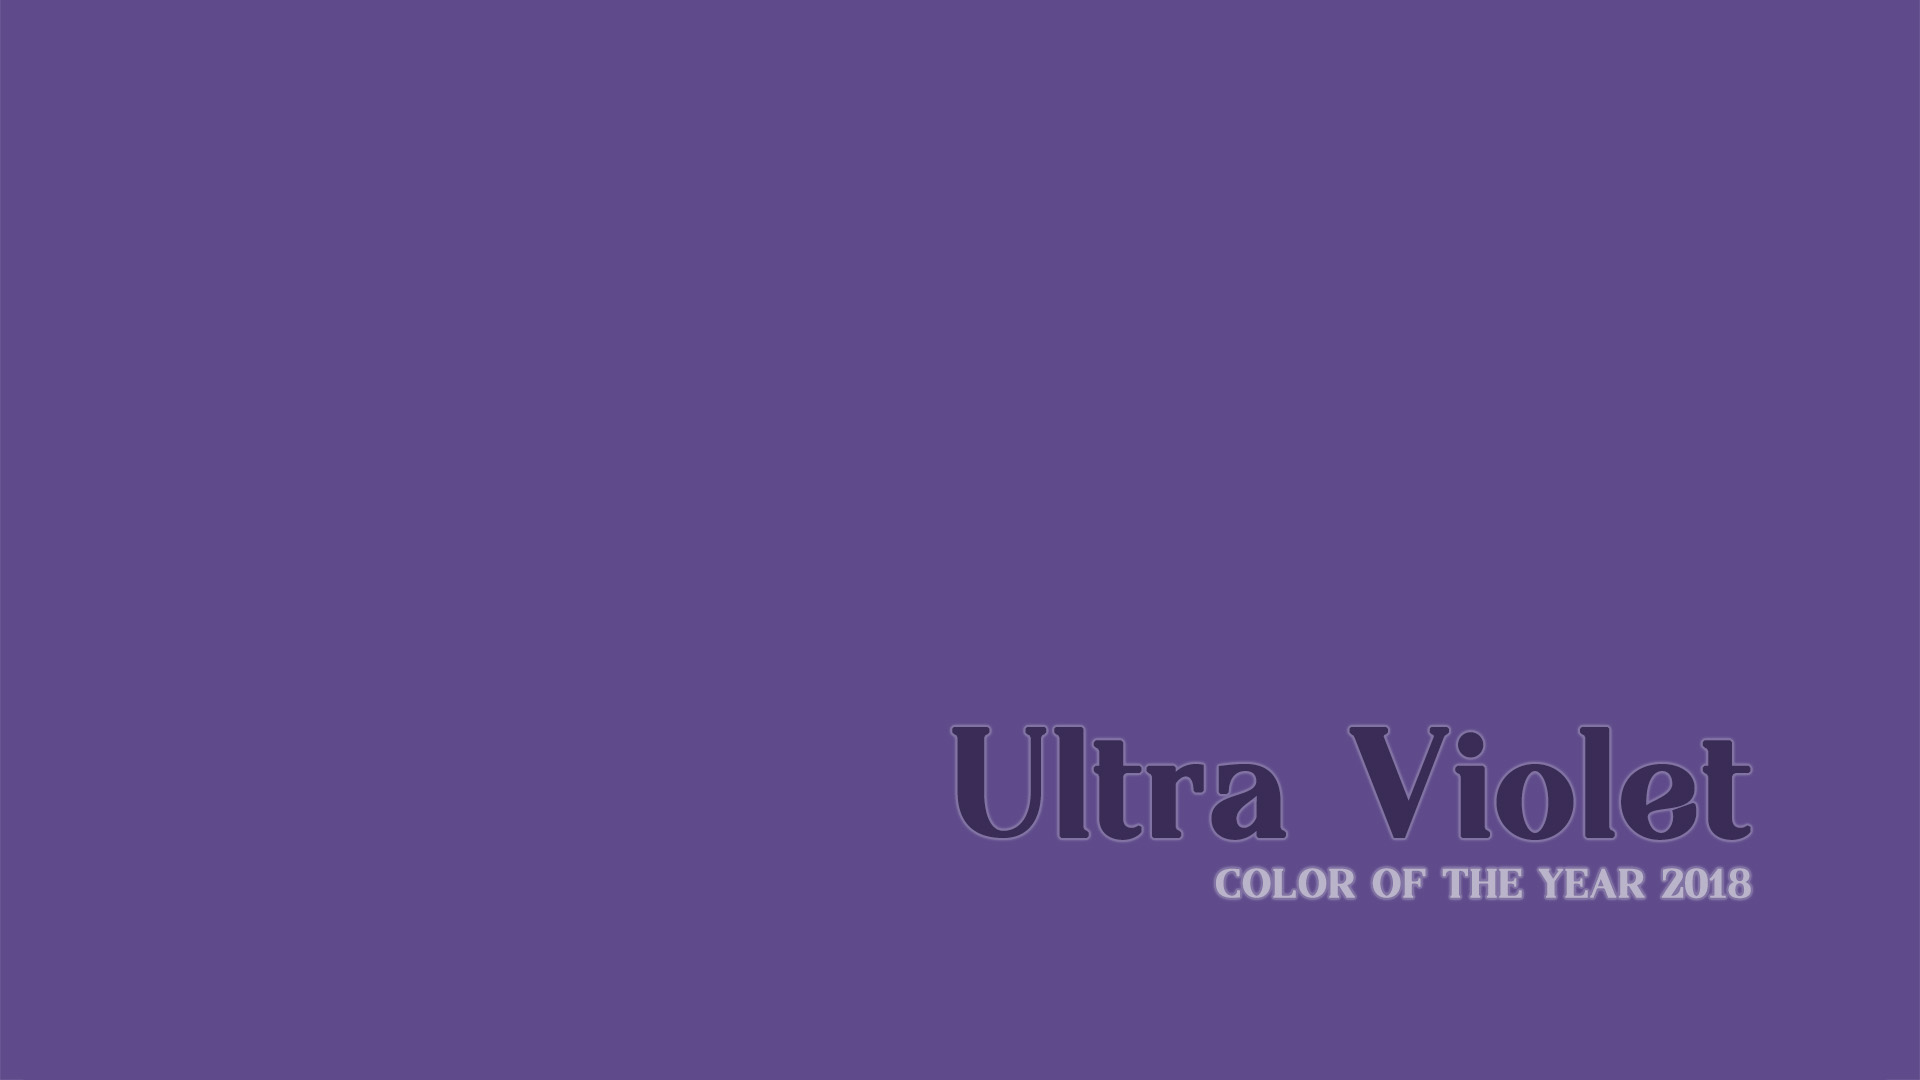 die farbe des jahres 2018 ultra violet hintergrundbilder. Black Bedroom Furniture Sets. Home Design Ideas